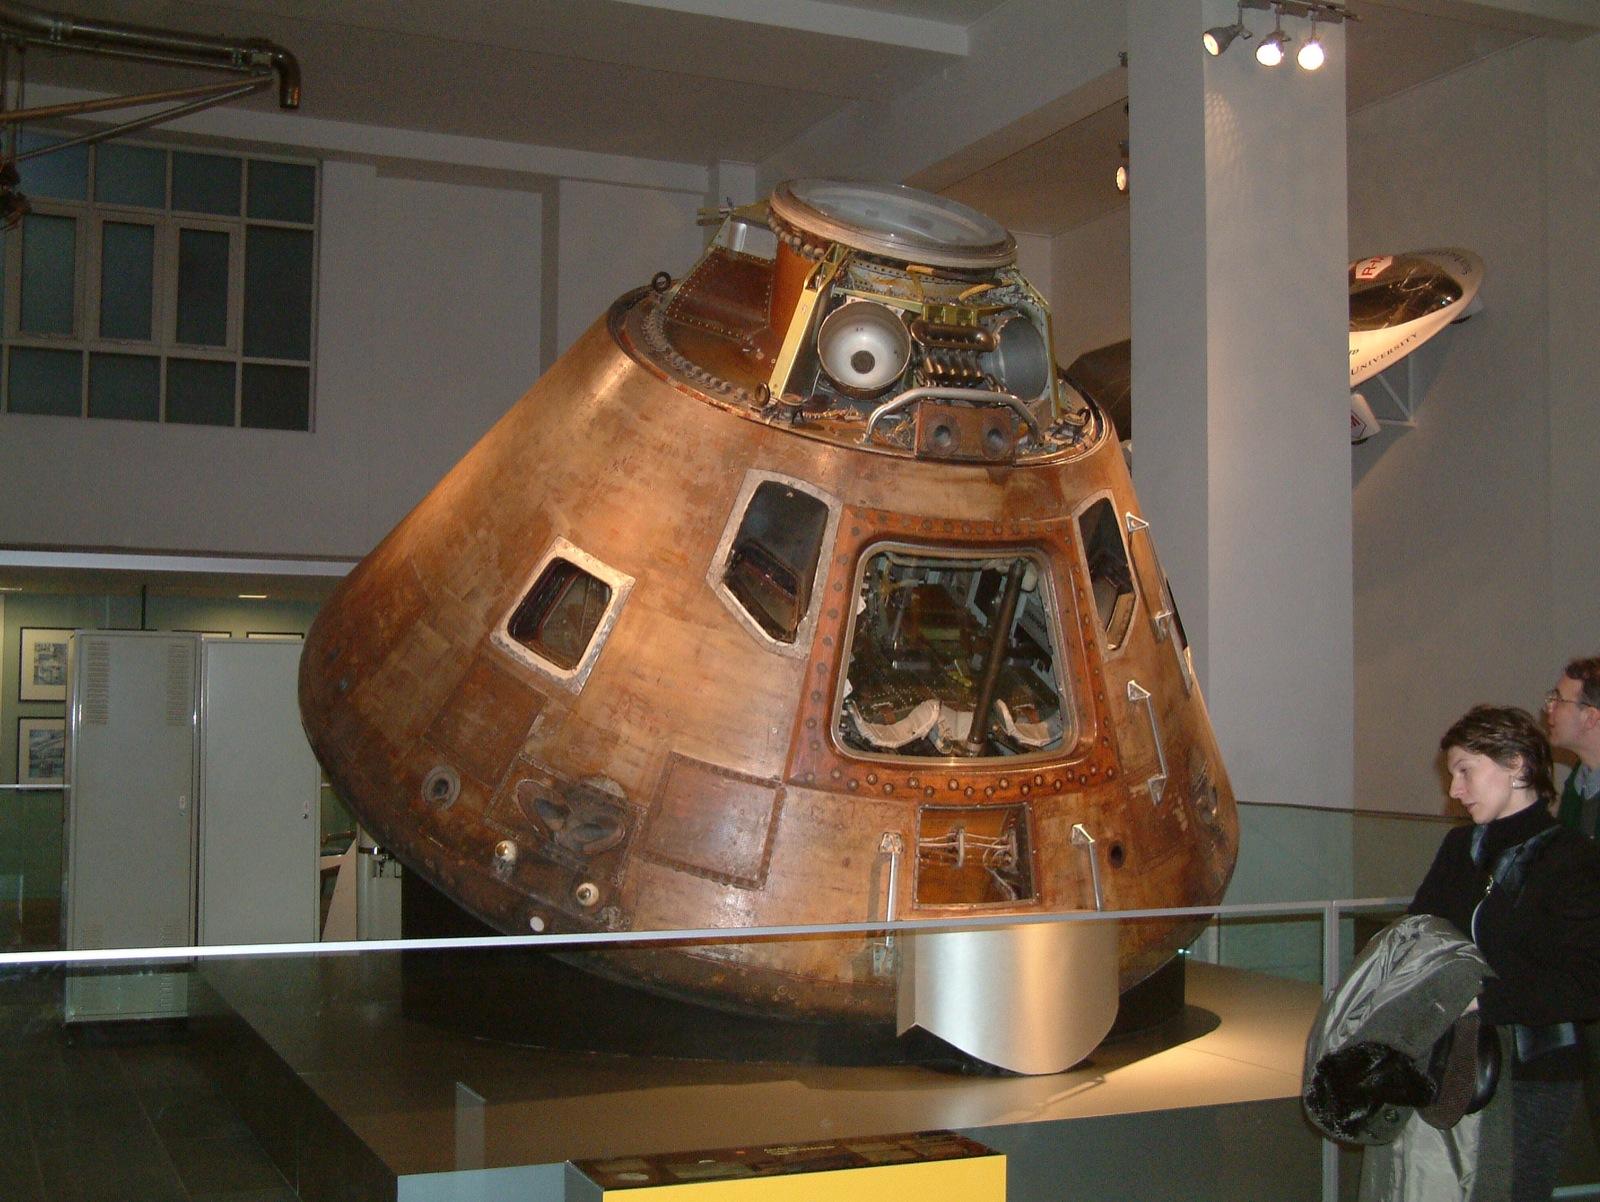 apollo 17 capsule - photo #30